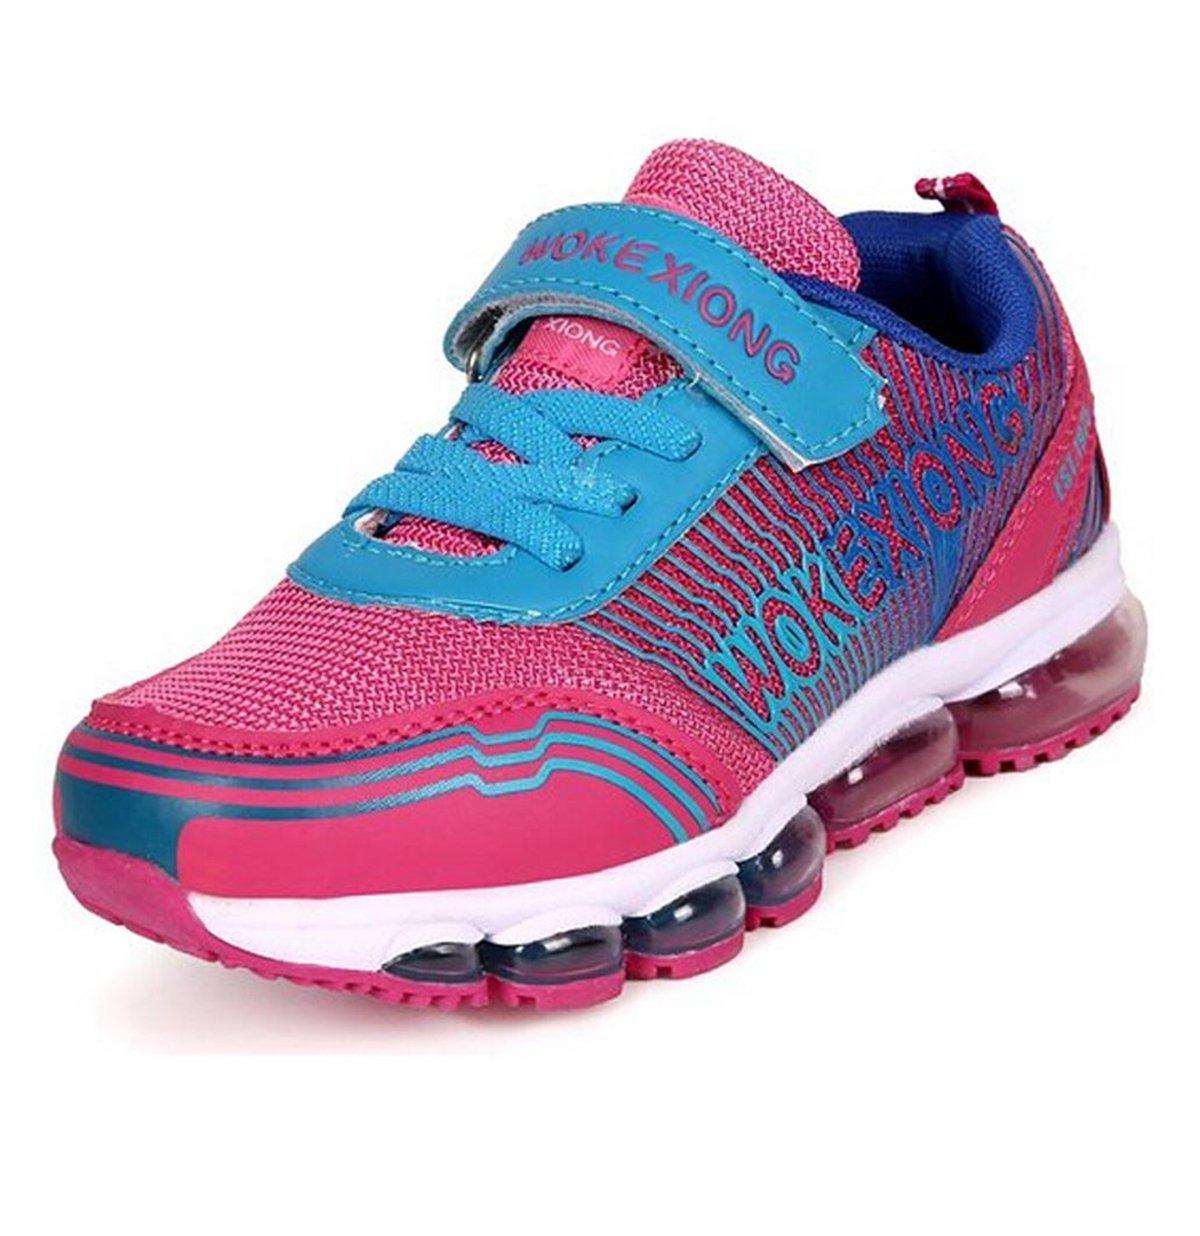 Zarbrina Sneakers for Girls and Boys Speed Air Cushion Boys Velcro School Sneakers (Little Kid/Big Kid) by Zarbrina Kids